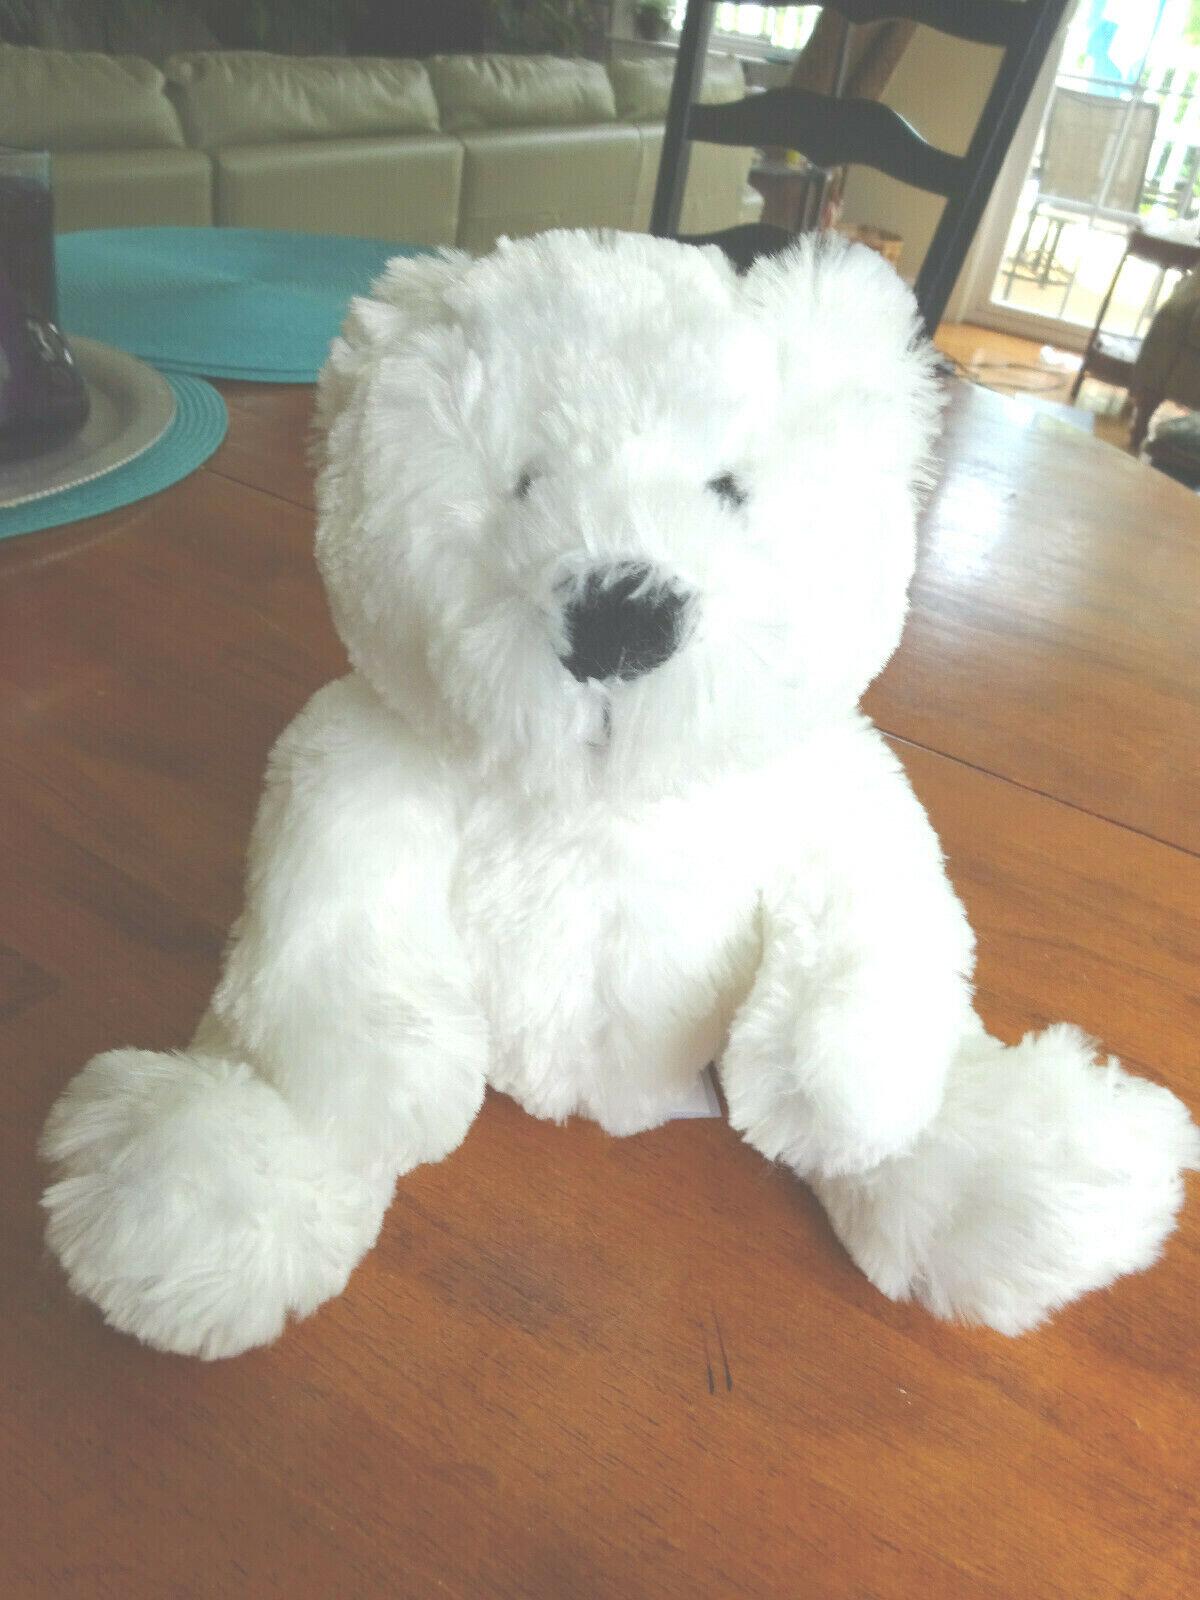 White Bear - Stuffed Animal - Furry Plush - RBI Ron Banafato, Inc. - 13  - $4.00